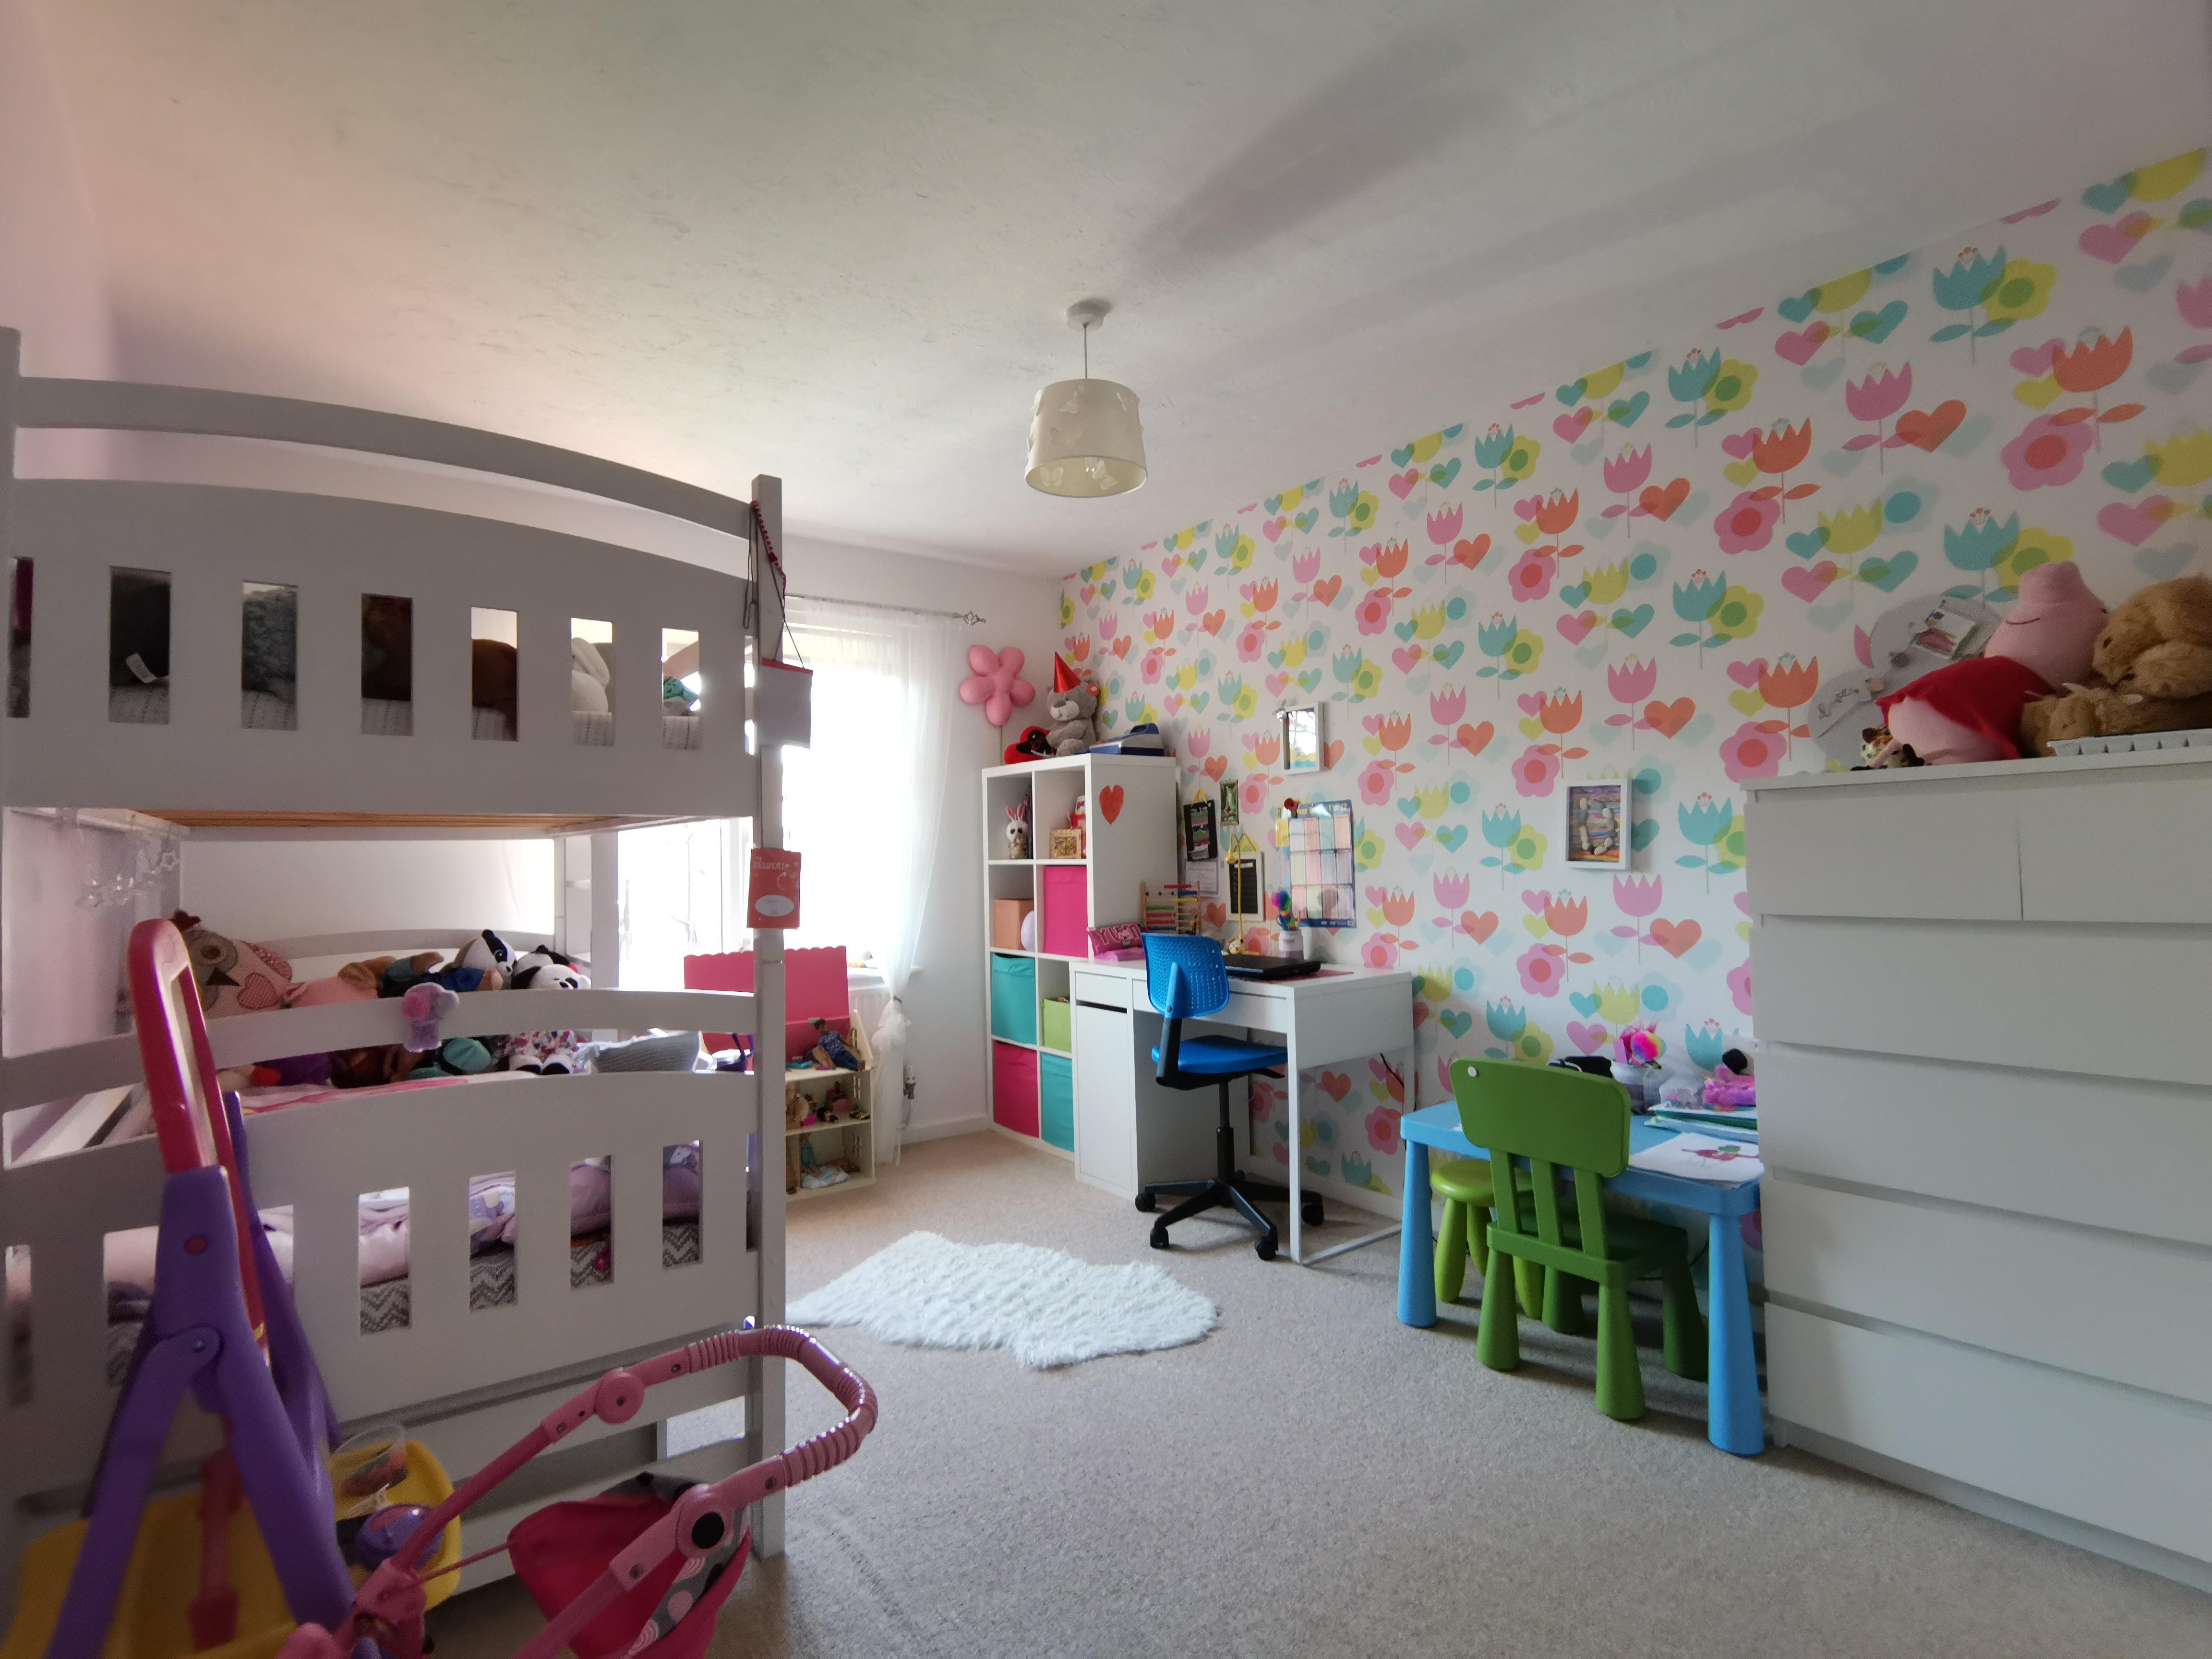 Flat 12 Heathcote Court, Heathcote Road - Bedroom 2